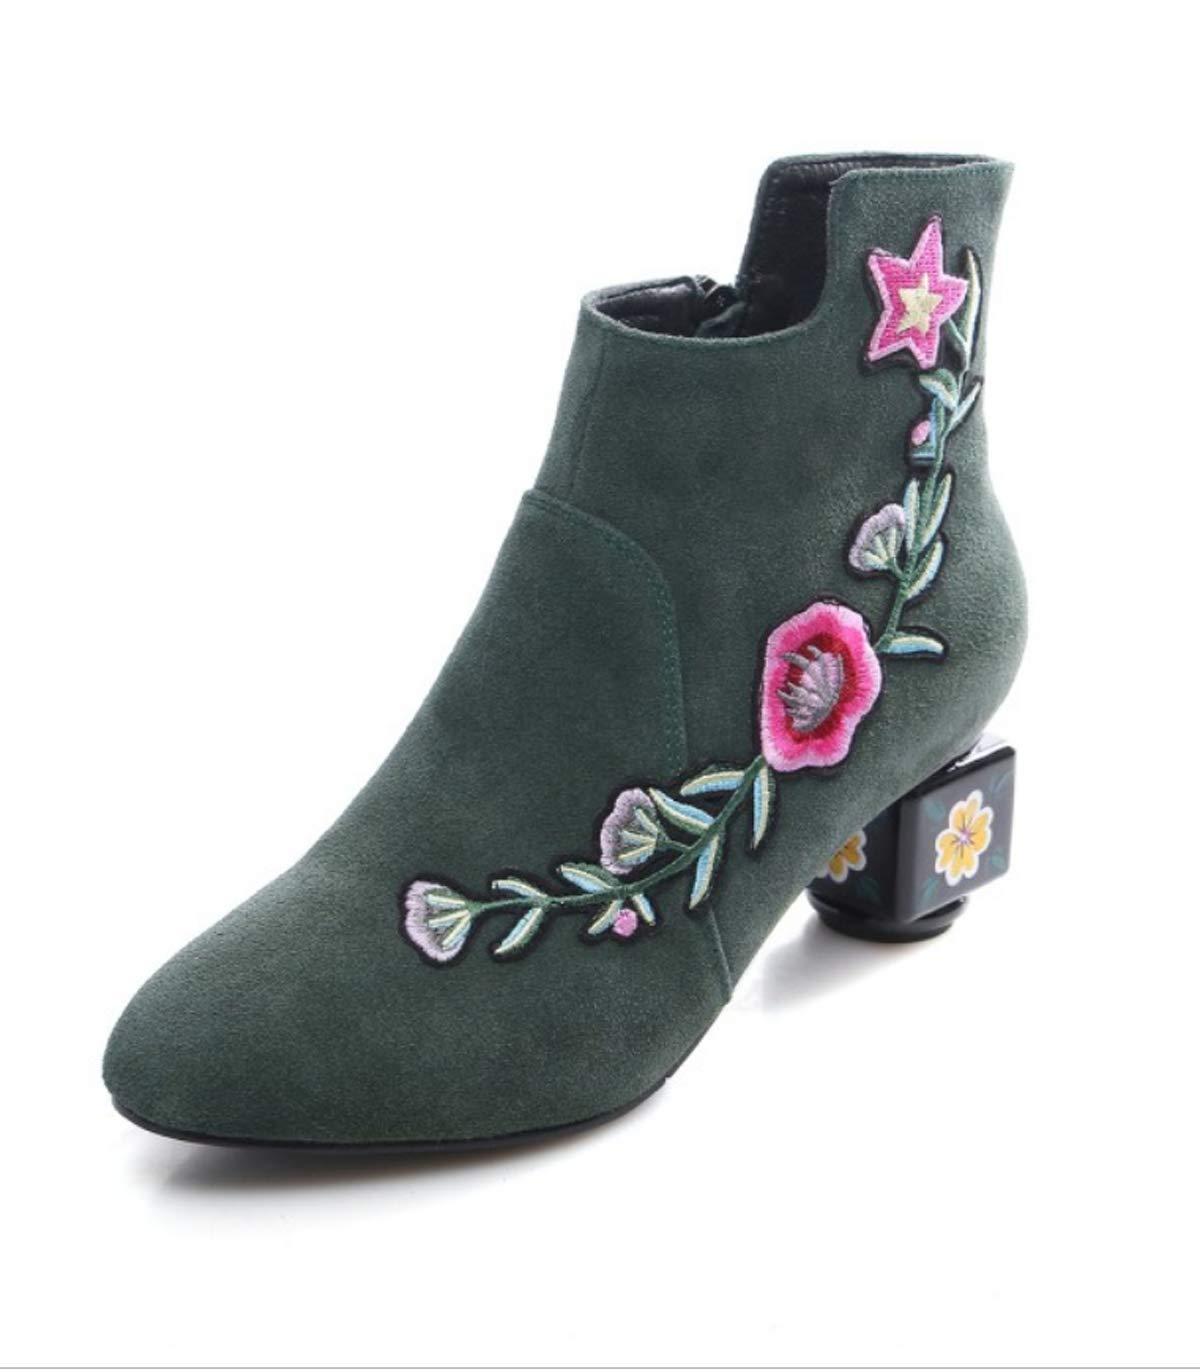 HBDLH Damenschuhe Schuhe In Samt Damenschuhe Schleifen Nationalen Stil Bestickt Hochzeit Schuhe